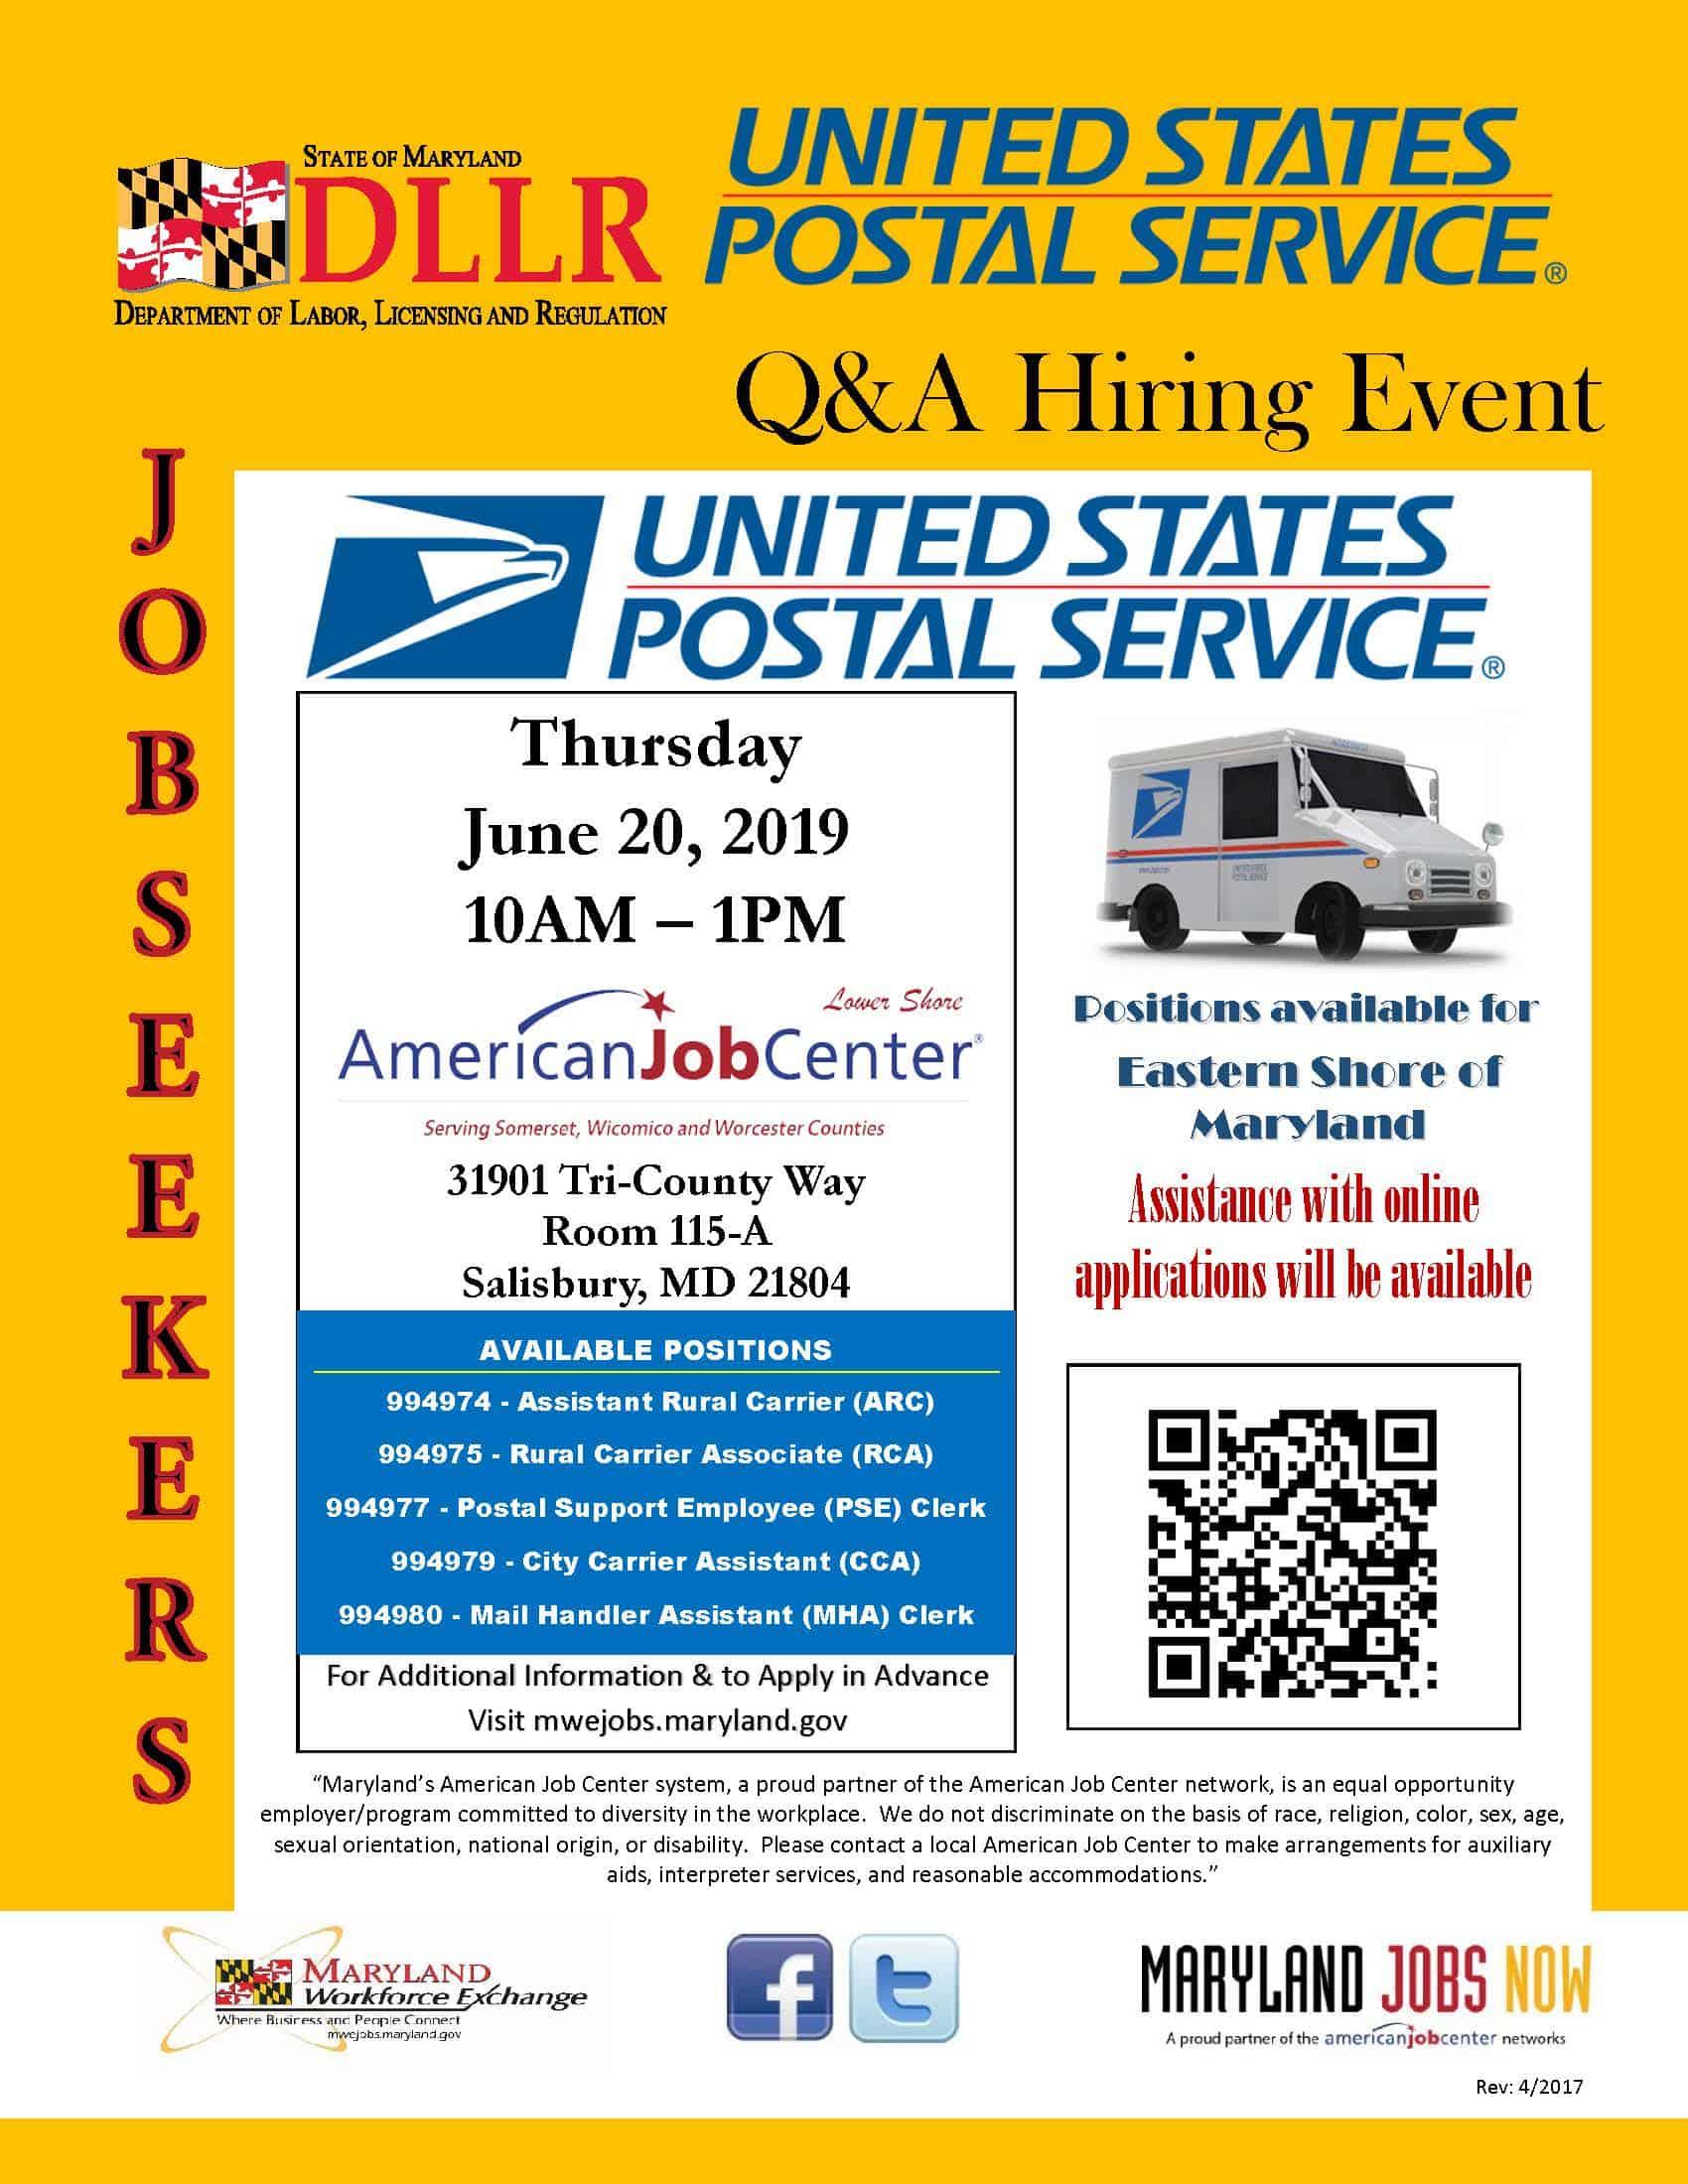 United States Postal Service Job Fair- June 20, 2019